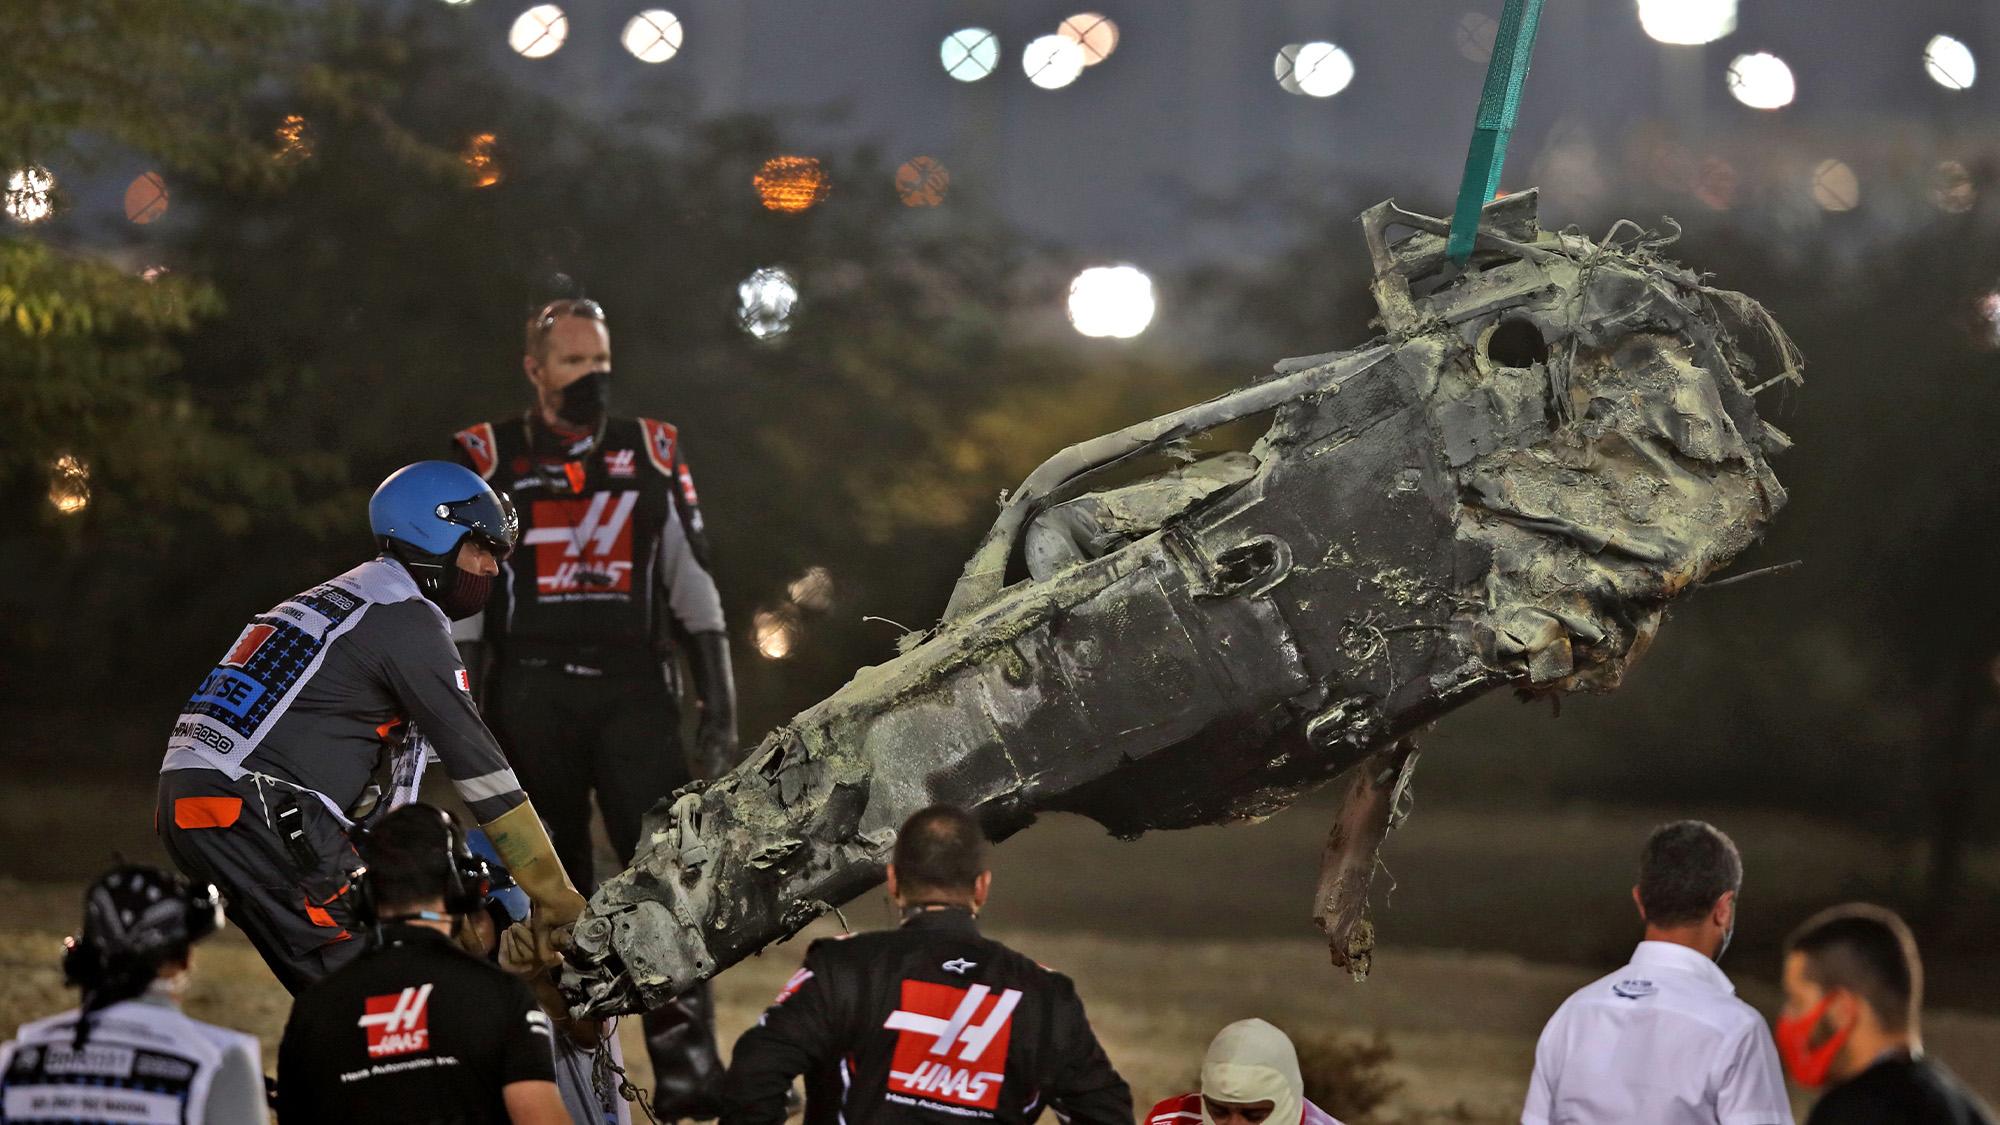 Wreckage of Romain Grosjeans Haas after the 2020 F1 Bahrain Grand Prix